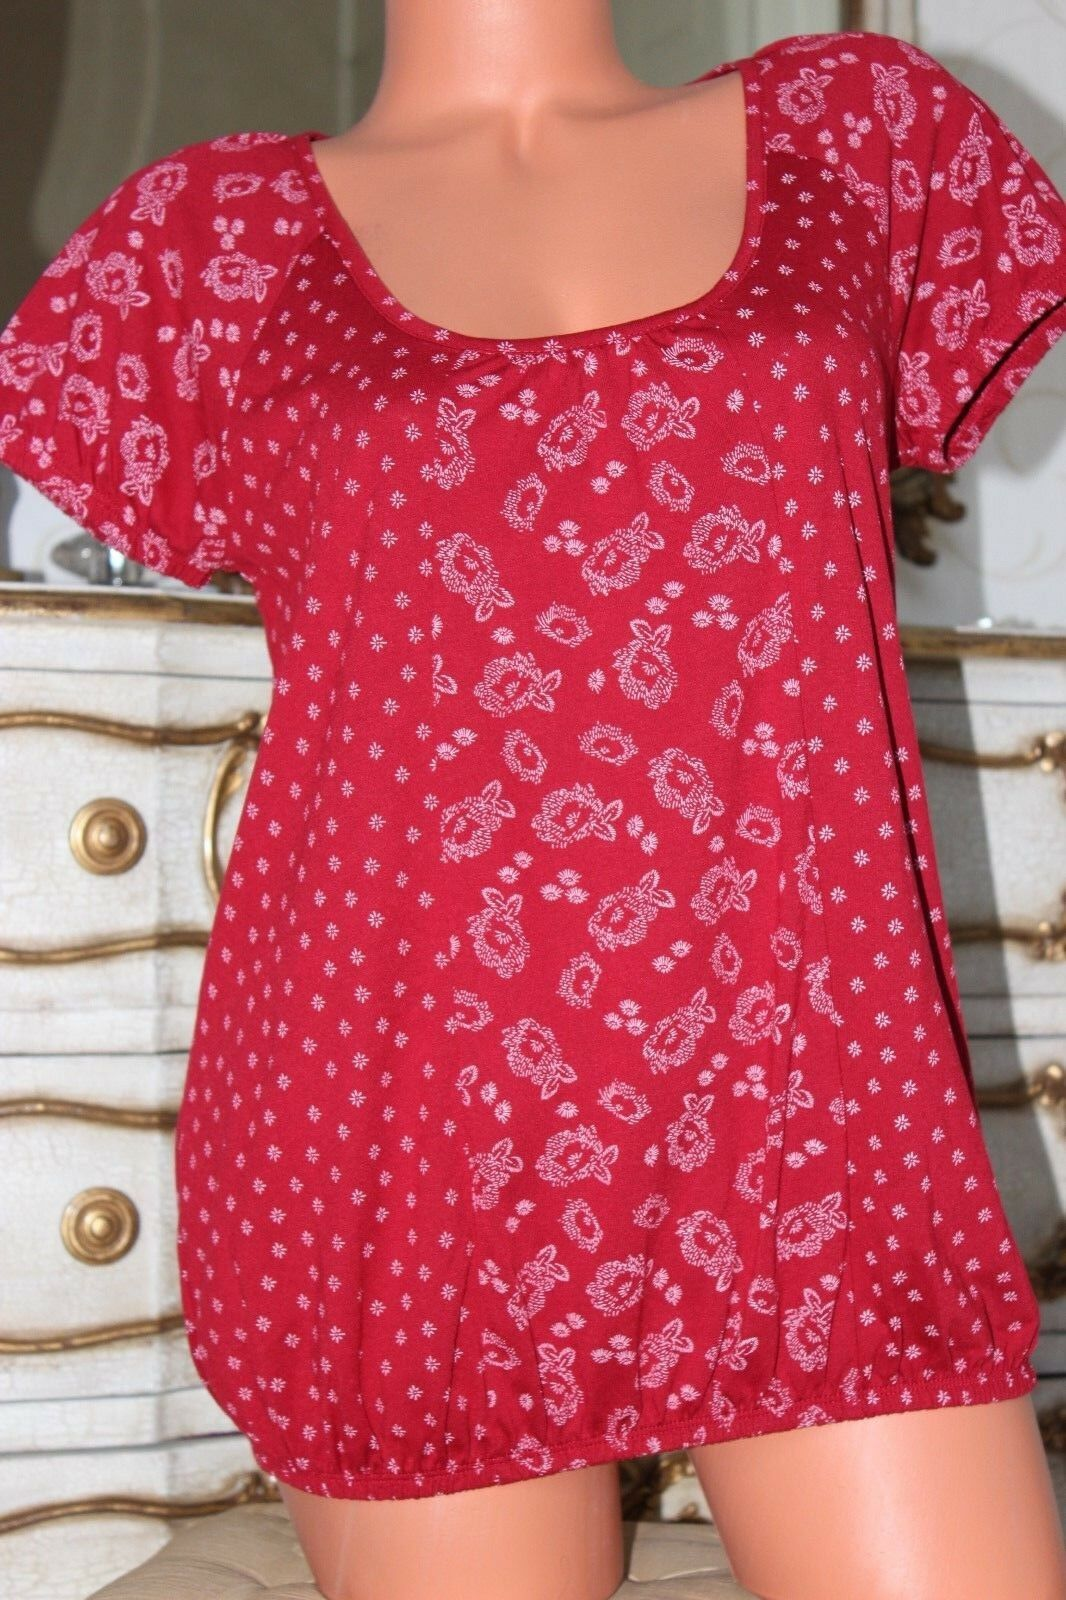 (Ref 20) TU Red  Viscose Mix Elasticated Summer Top T shirt Size 10